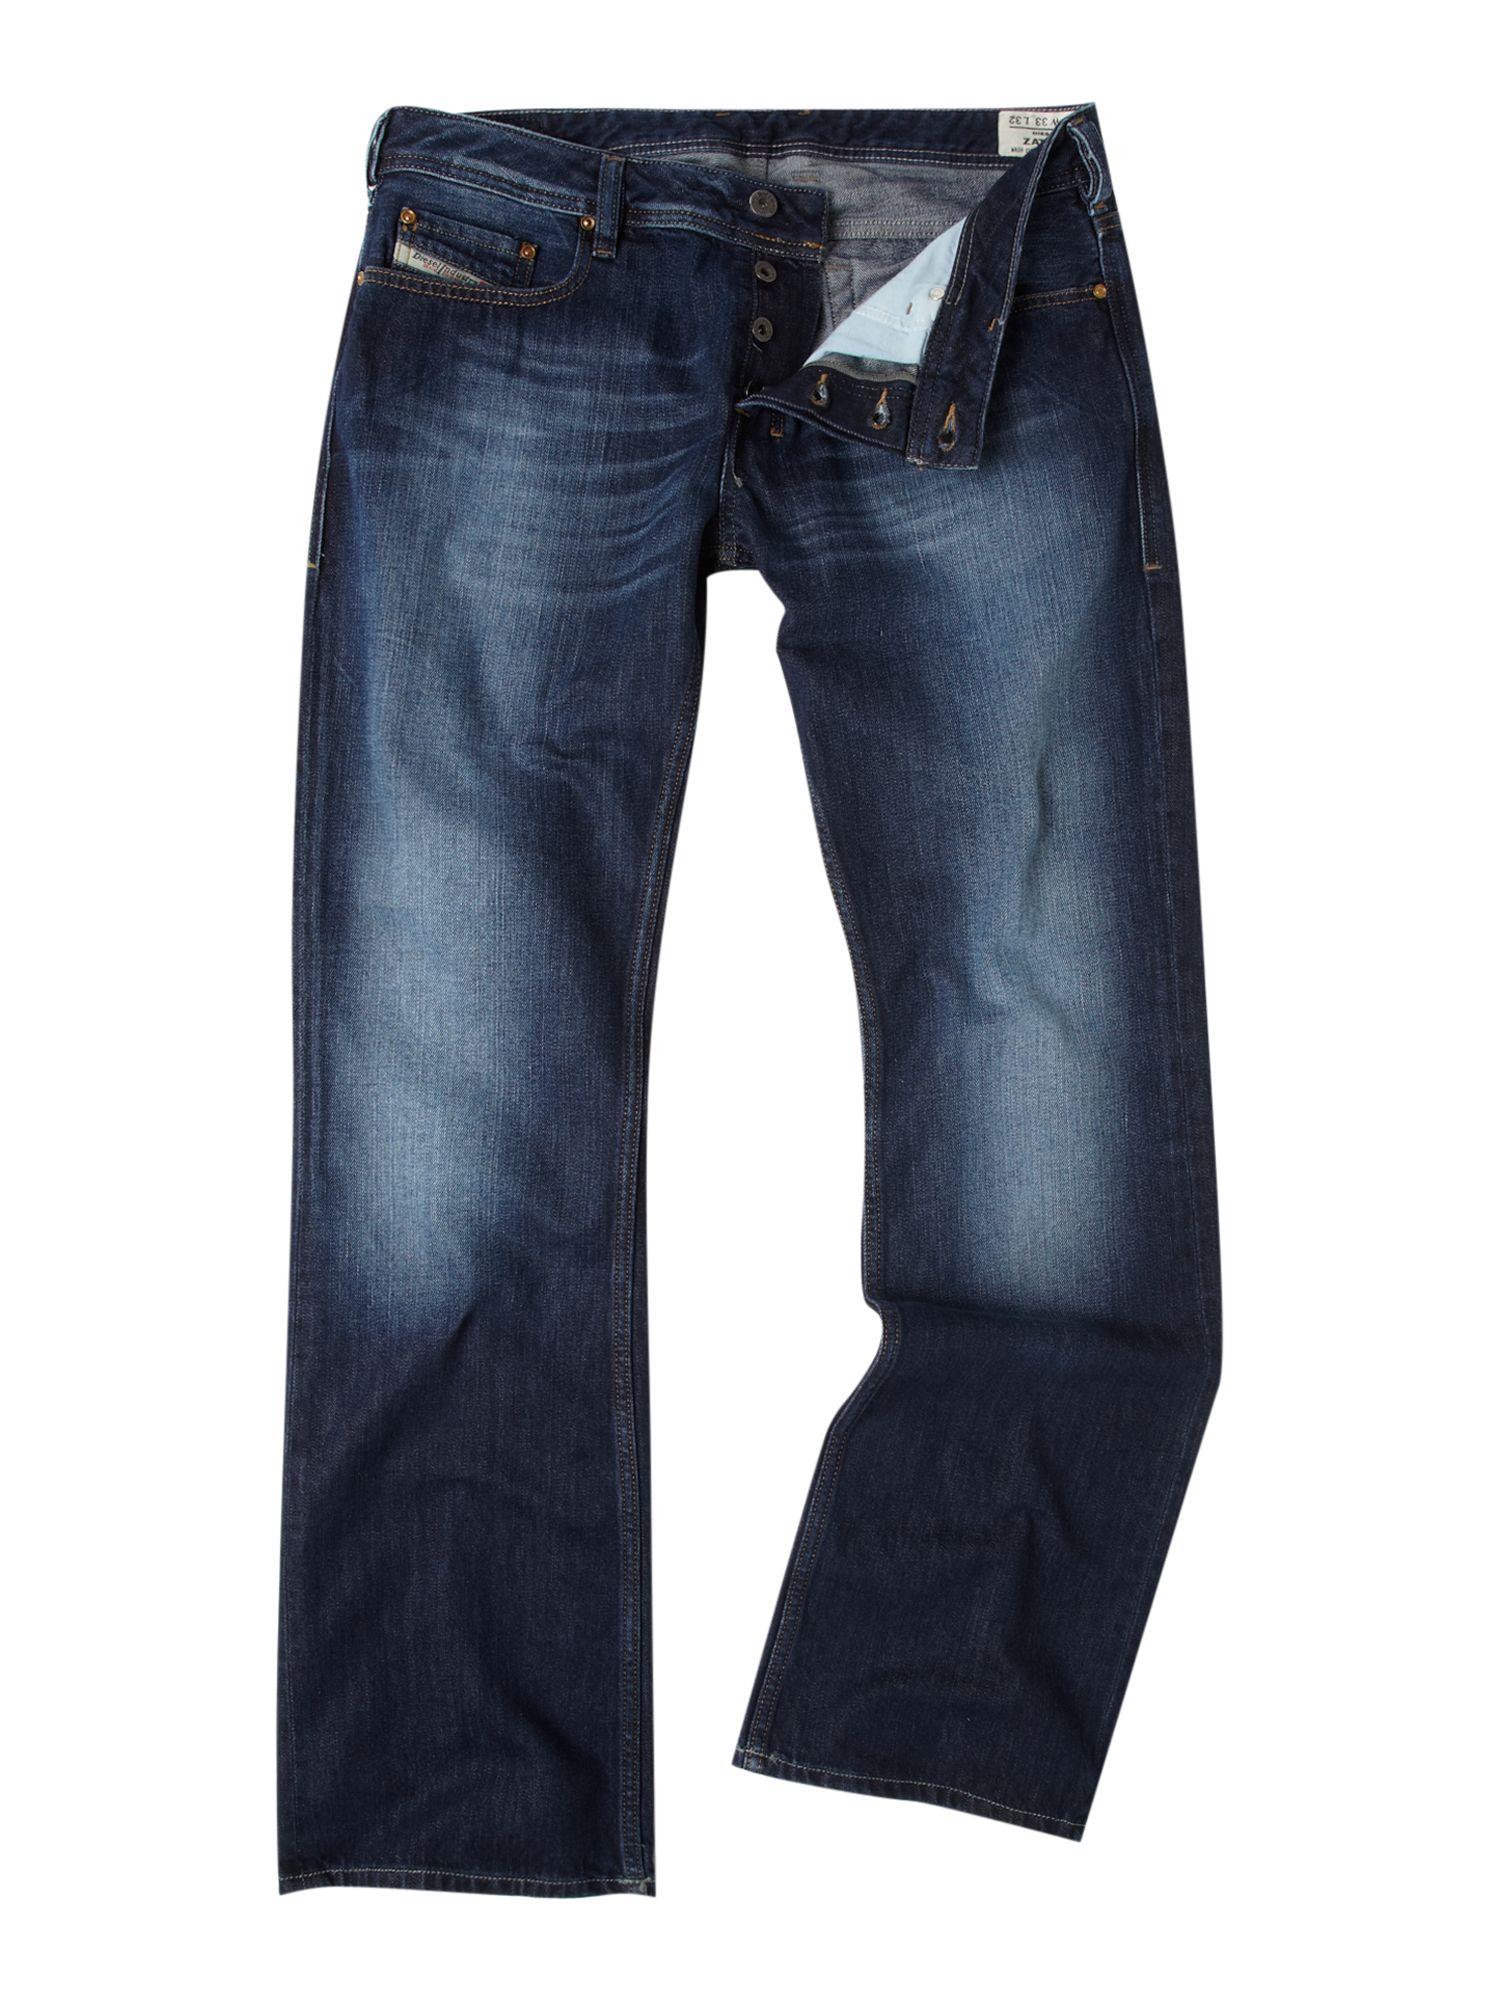 Mens Dark Wash Bootcut Jeans - Xtellar Jeans